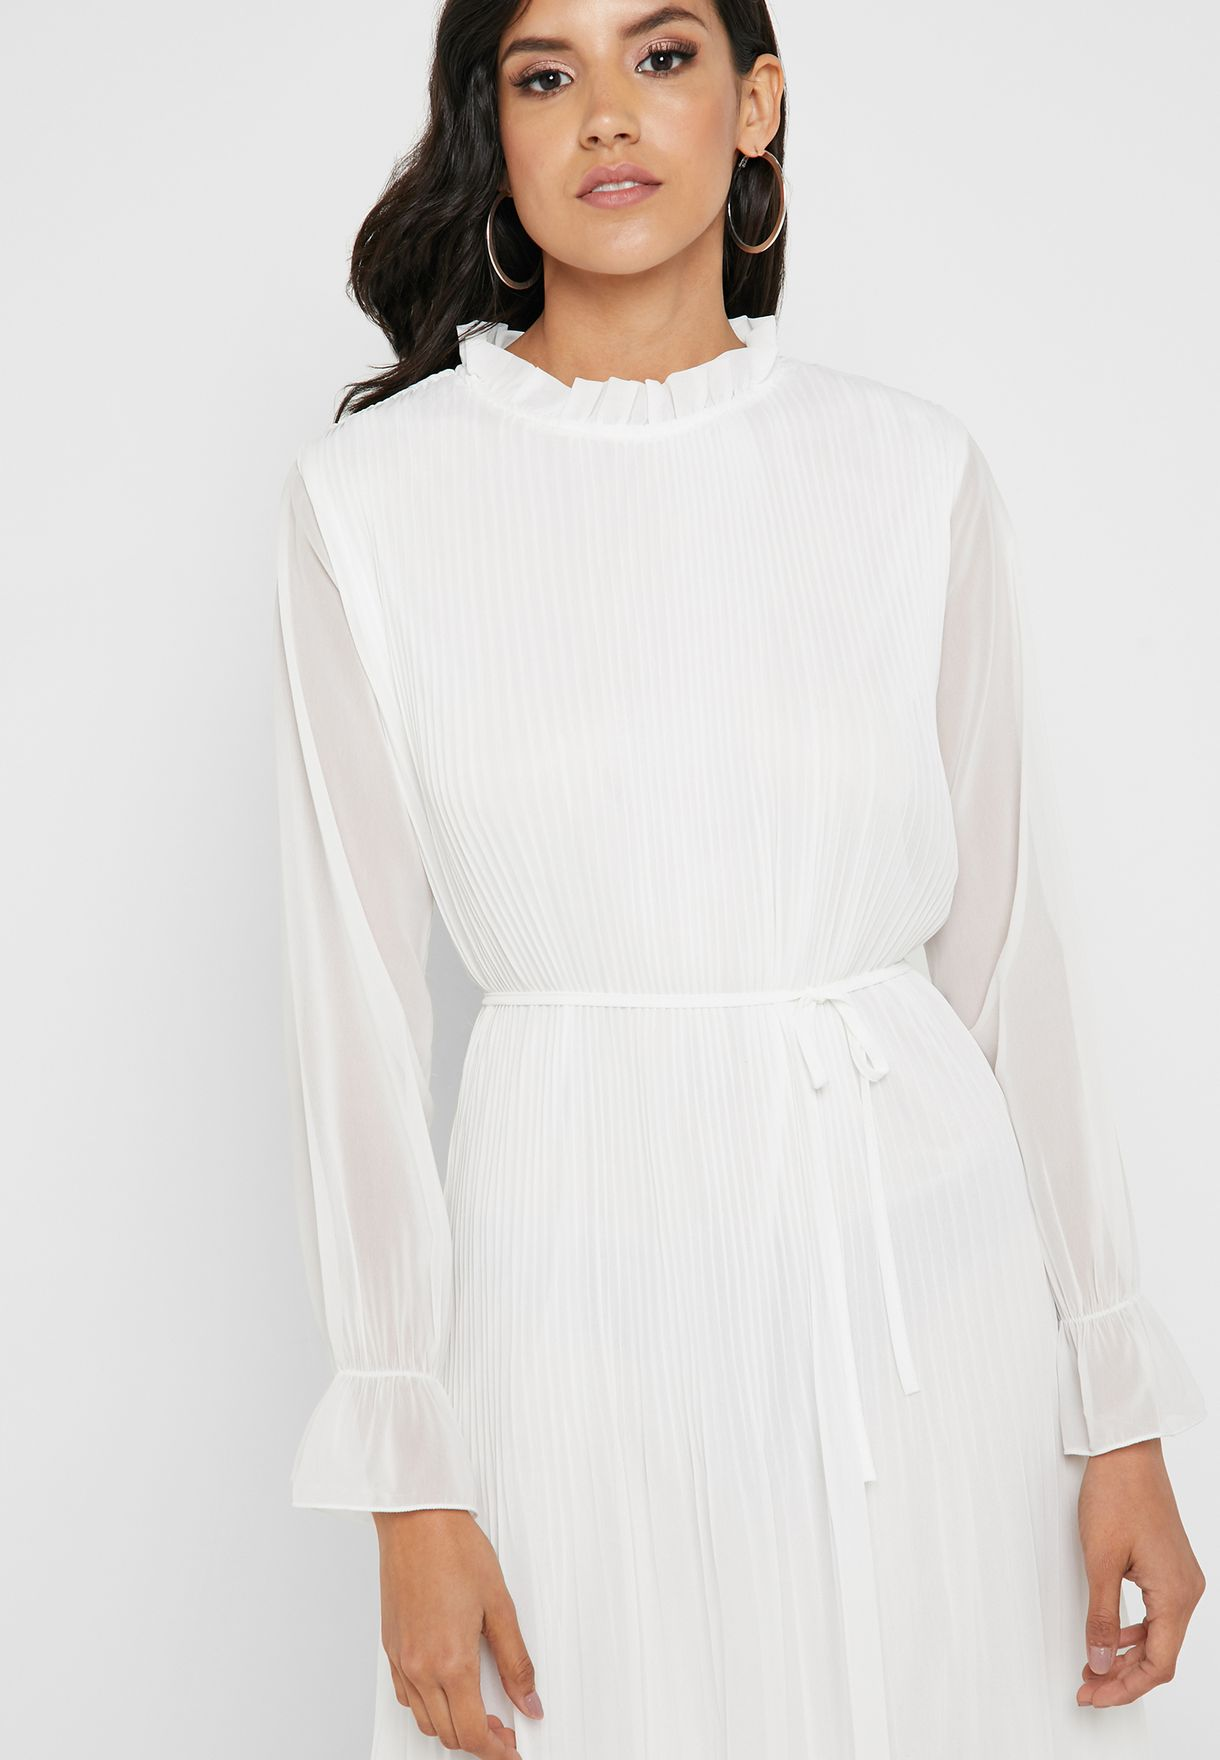 Pleated High Neck Self Tie Midi Dress